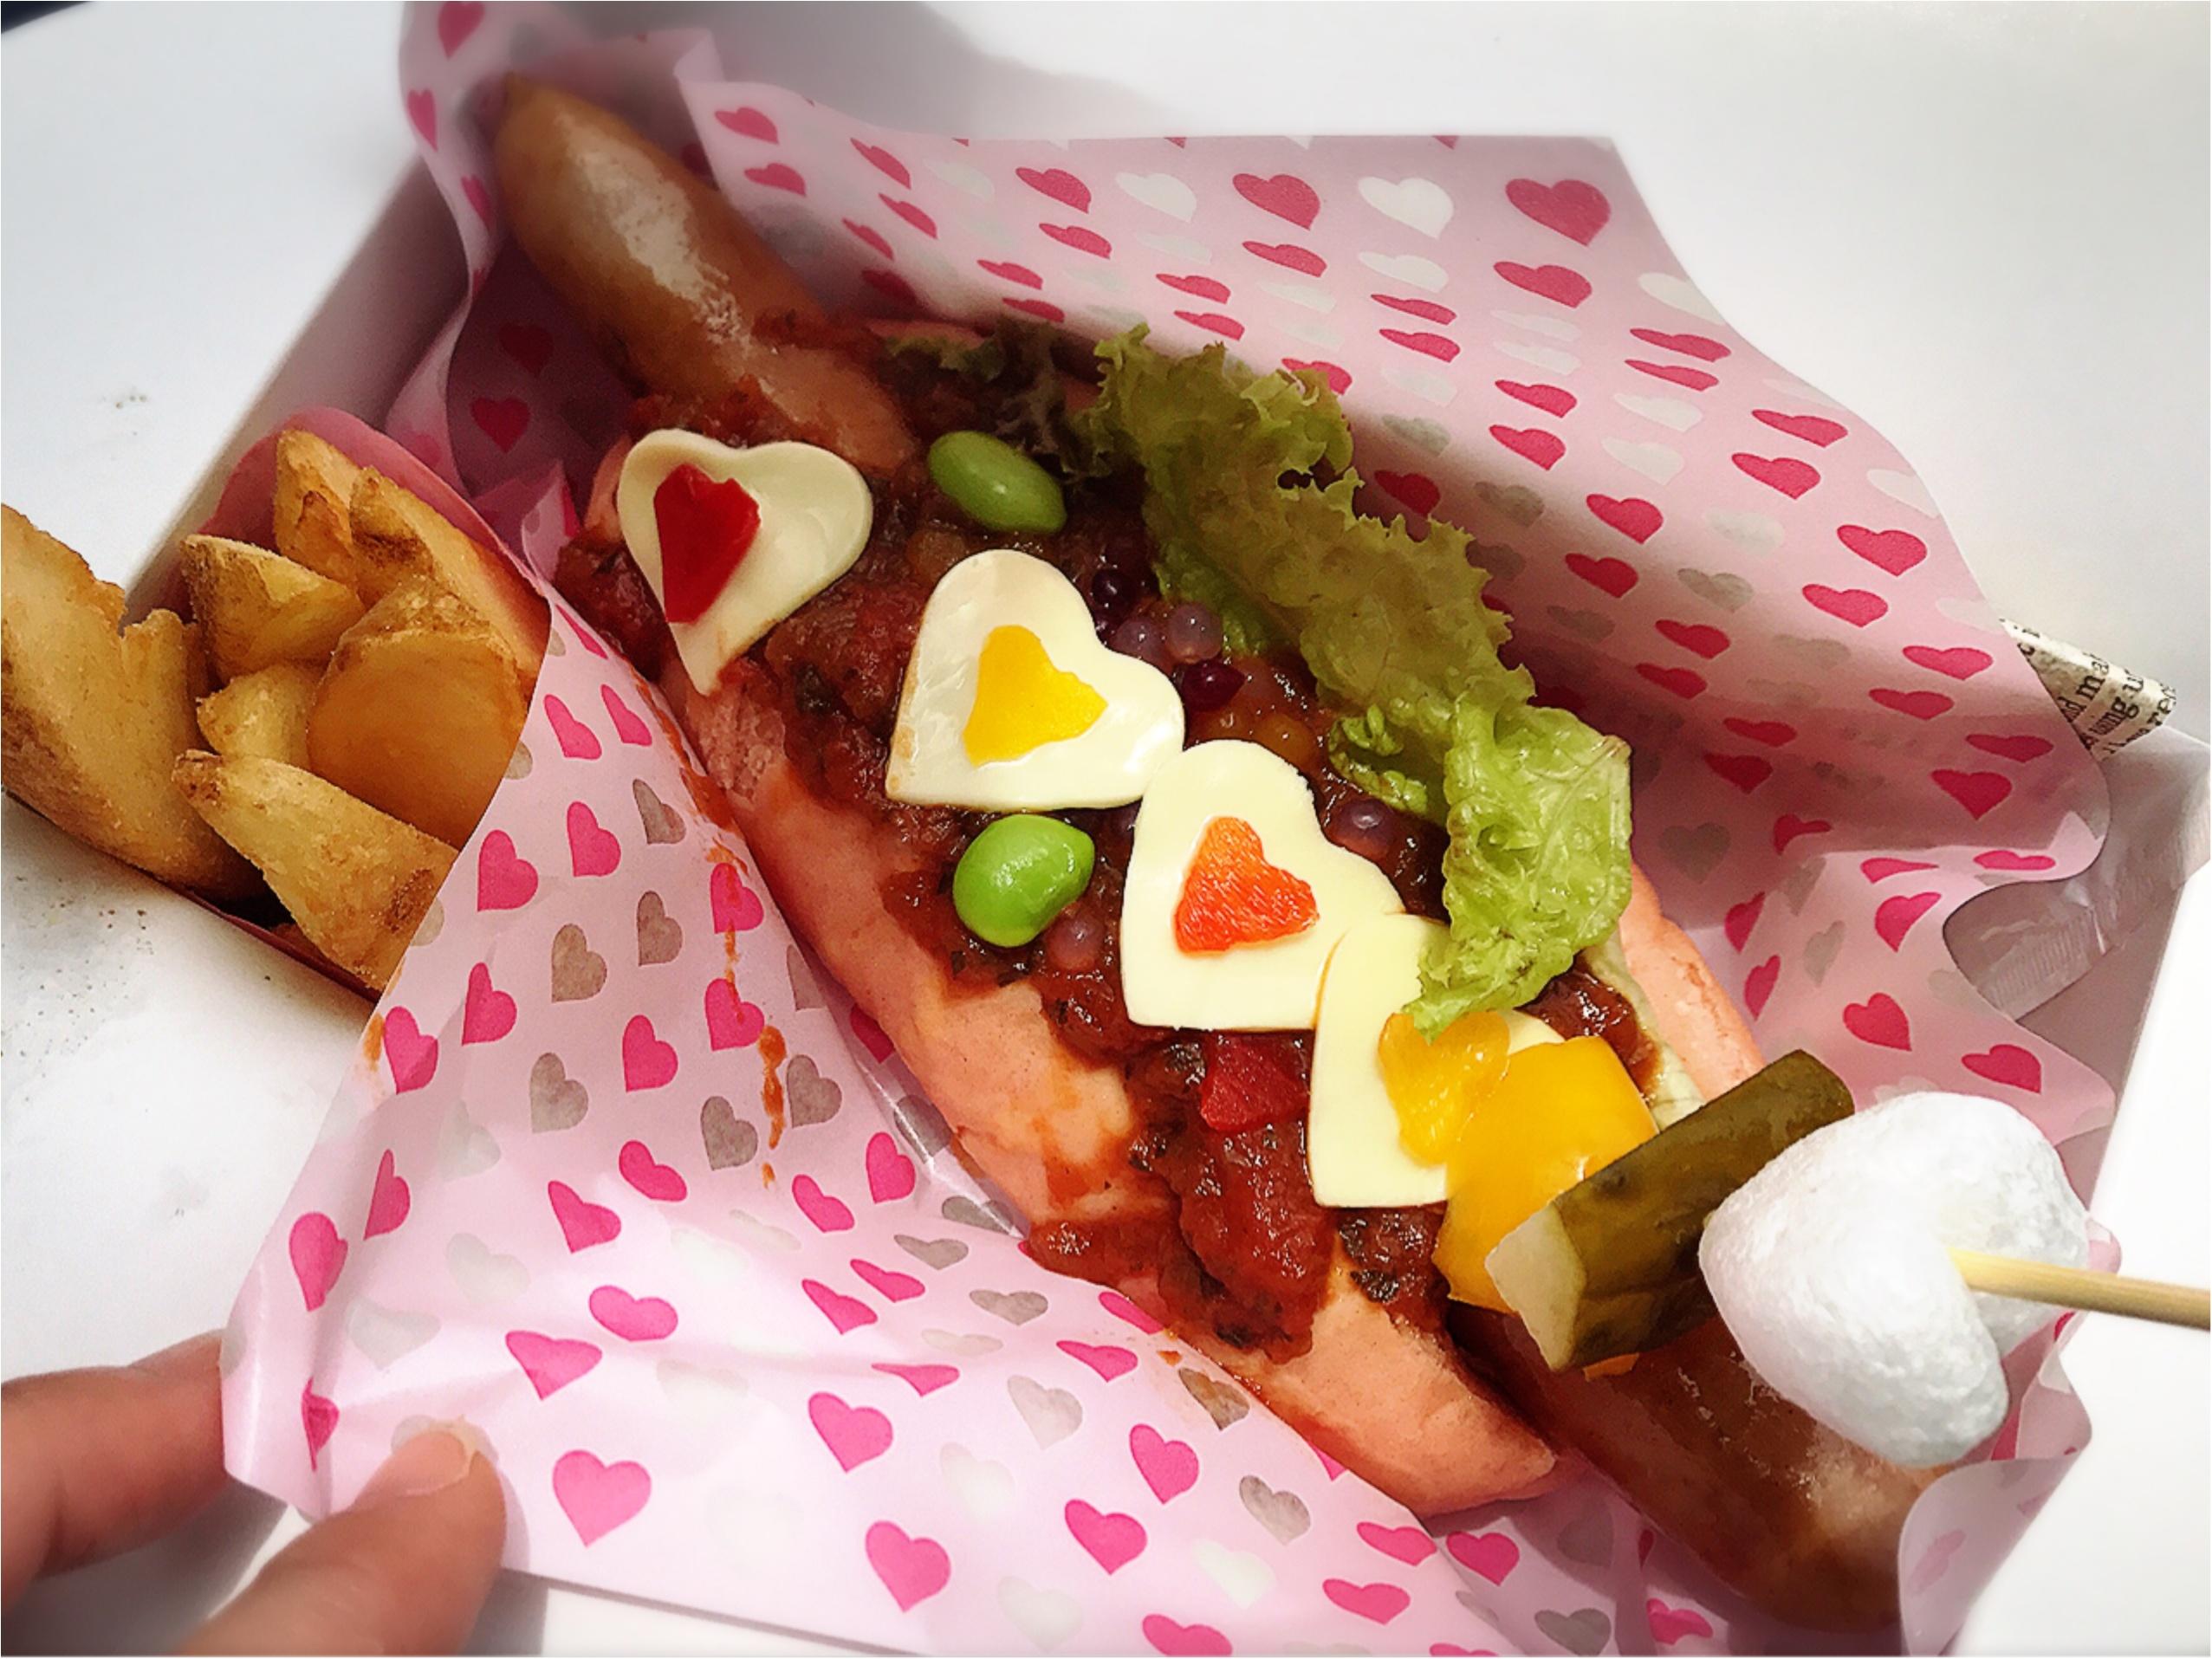 【FOOD】沖縄で人気のカフェが池袋に♡!これから流行る!\LA❤︎Hotdogs Factory/_3